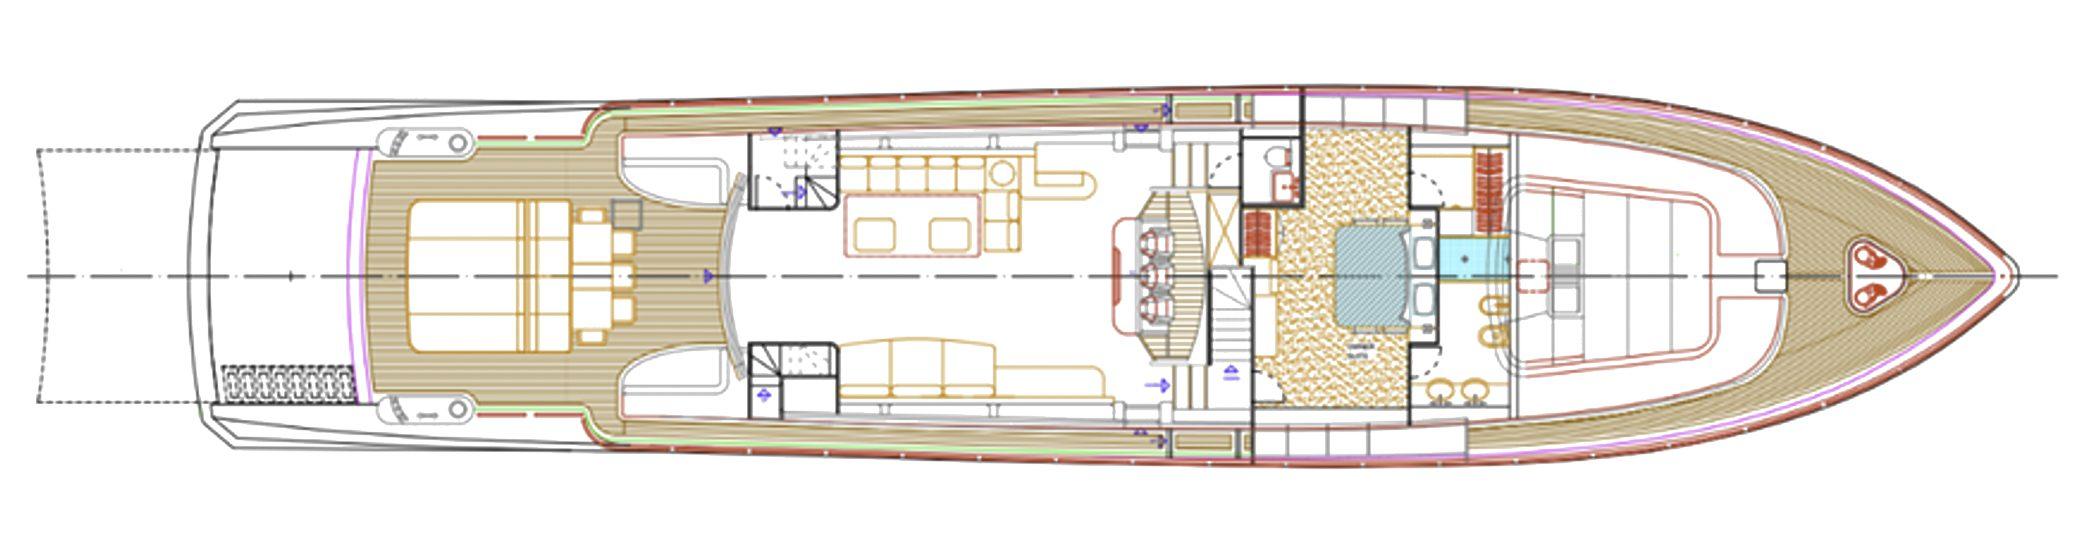 main deck design leopard version 2